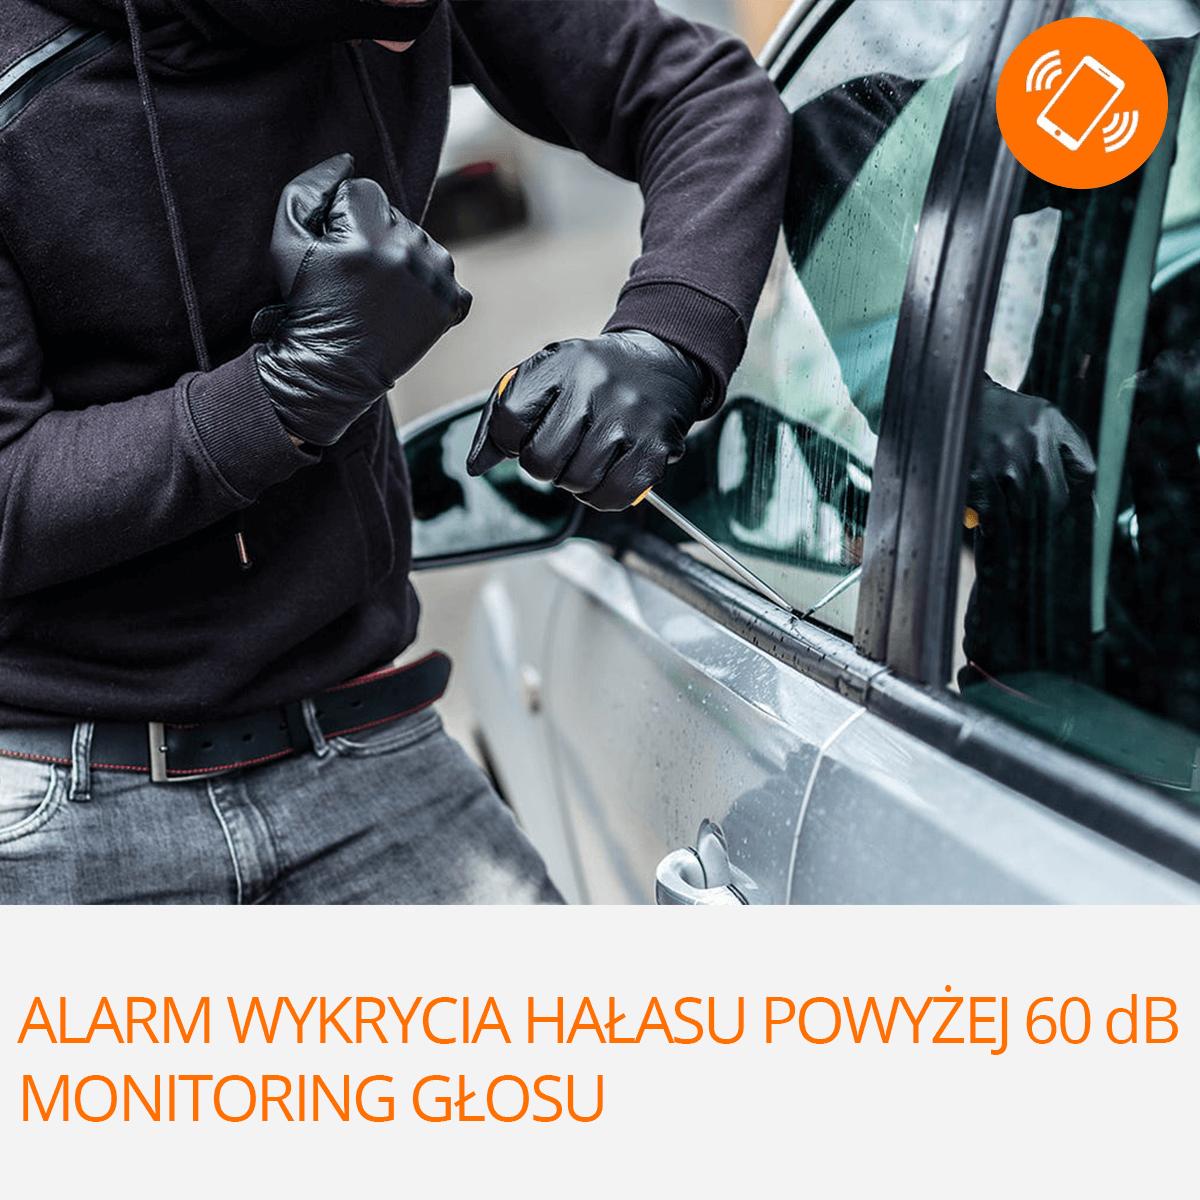 Lokalizator-samochodowy-alarm-wykrycia-halasu-orllo-pl